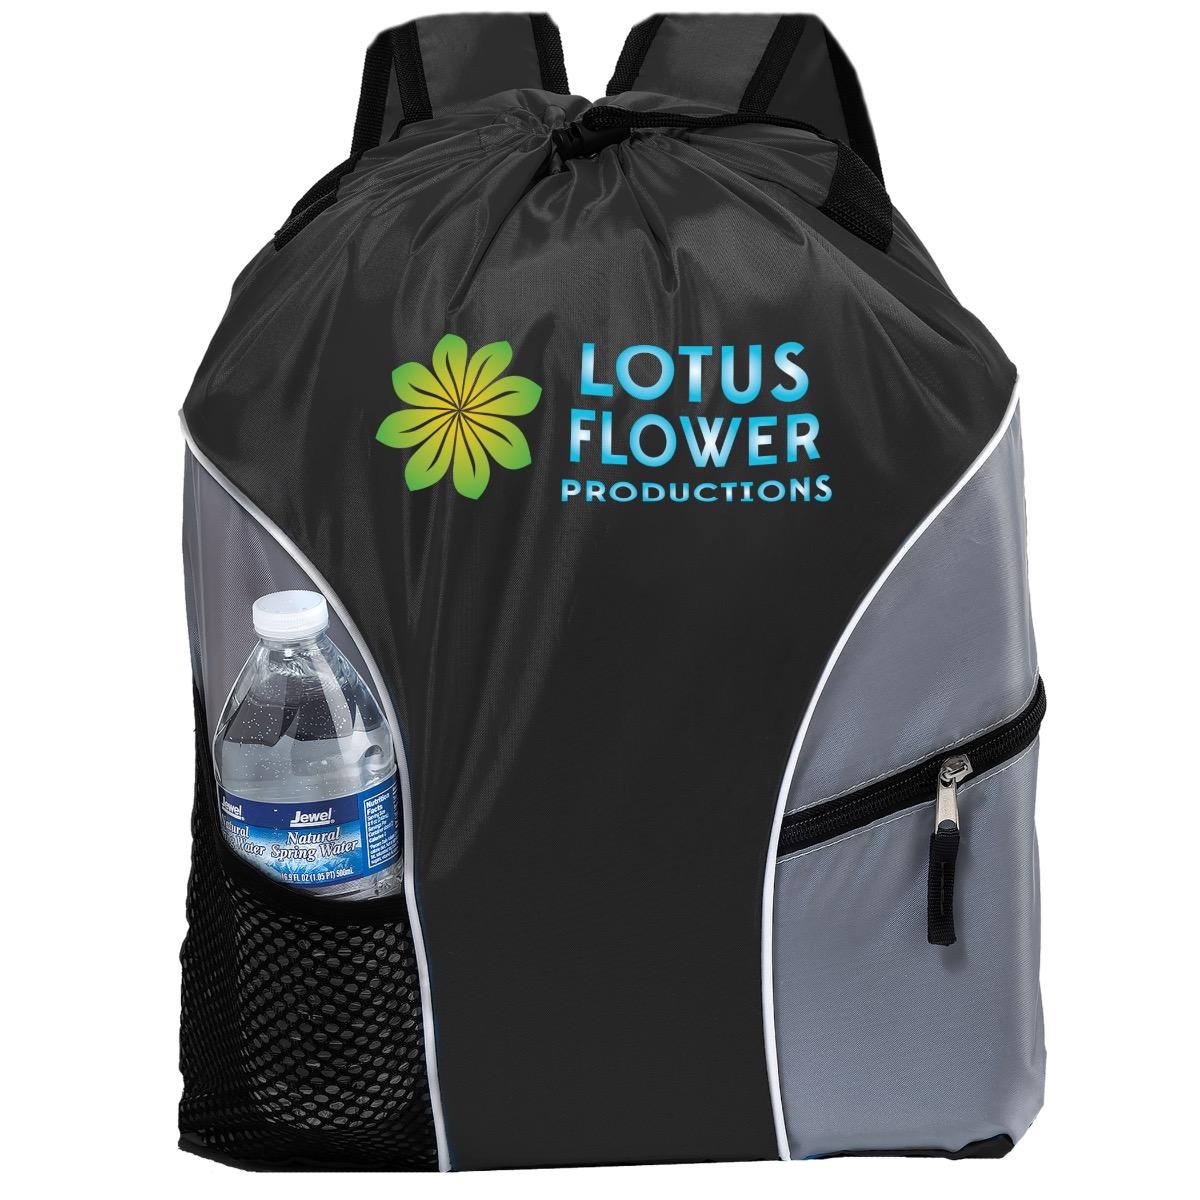 Eco-Friendly Imprinted Backpacks - Black 38163a7fdaaa6